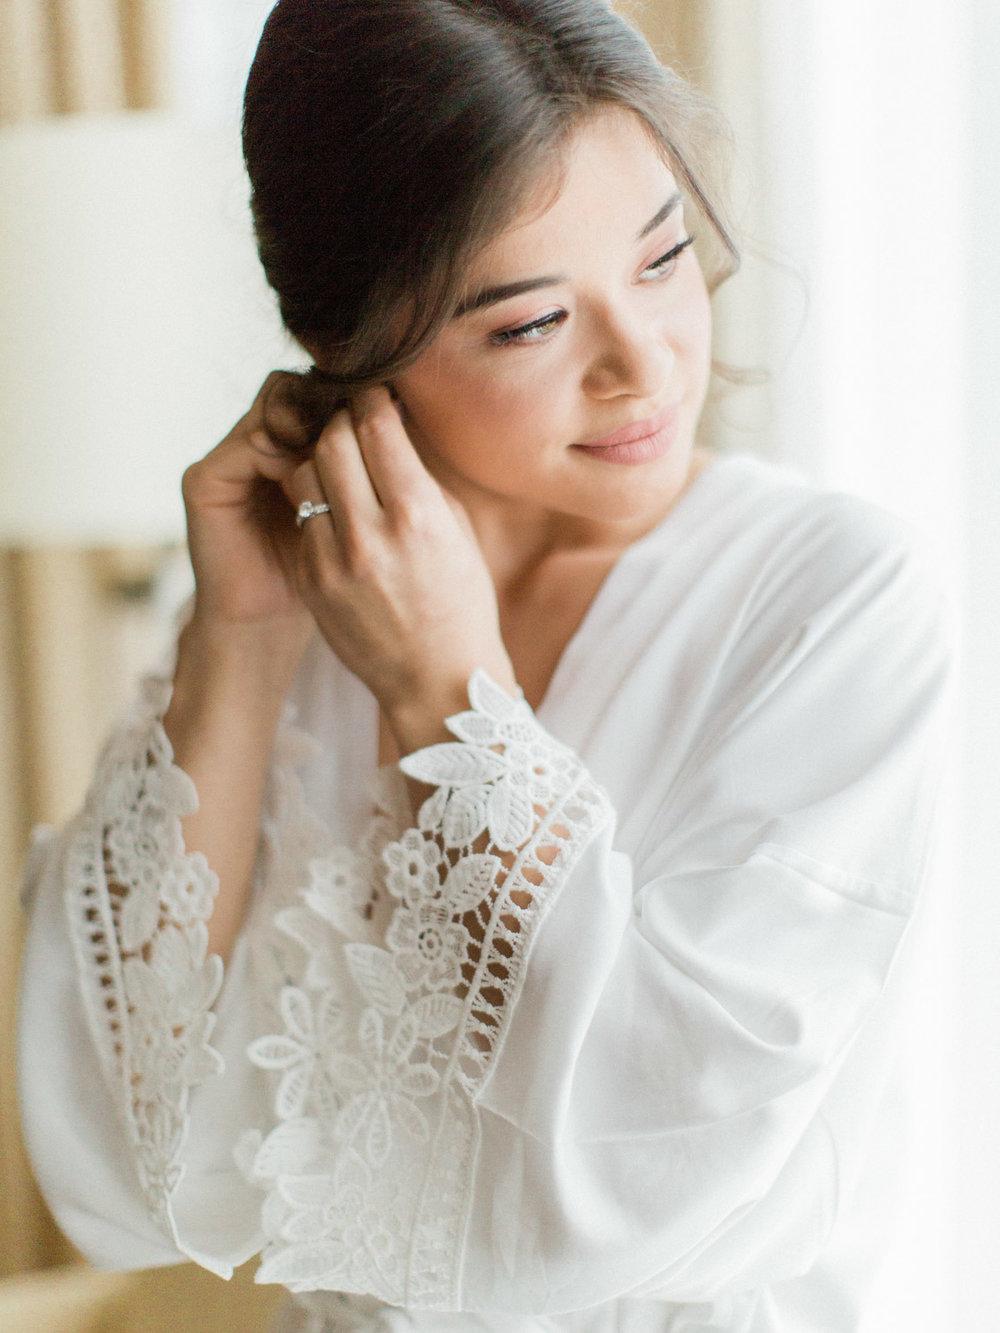 Toronto-wedding-photographer-intimate-italian-the-burroughes-downtown10.jpg